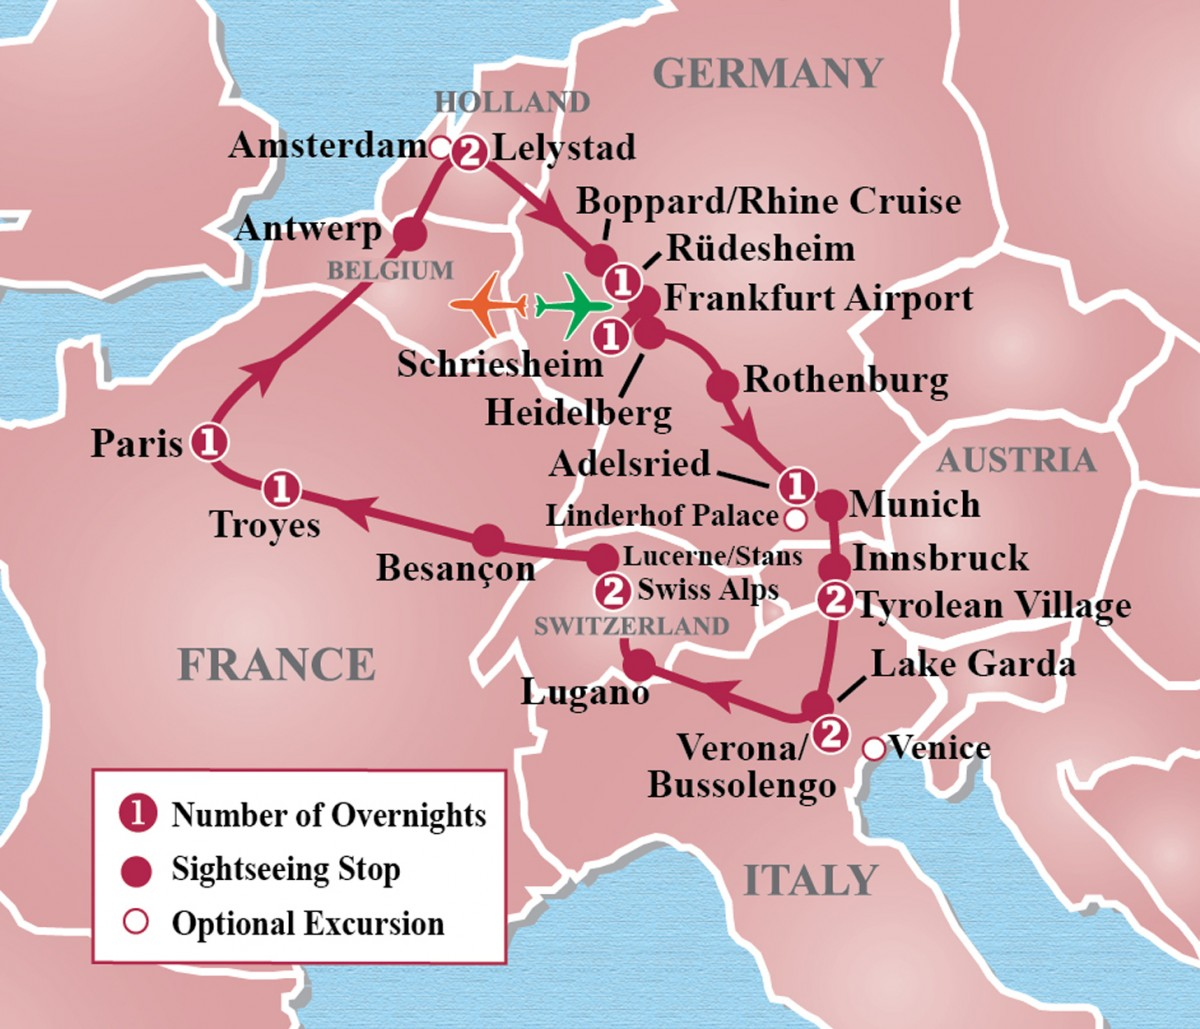 Heart of Europe Circle Tour Map